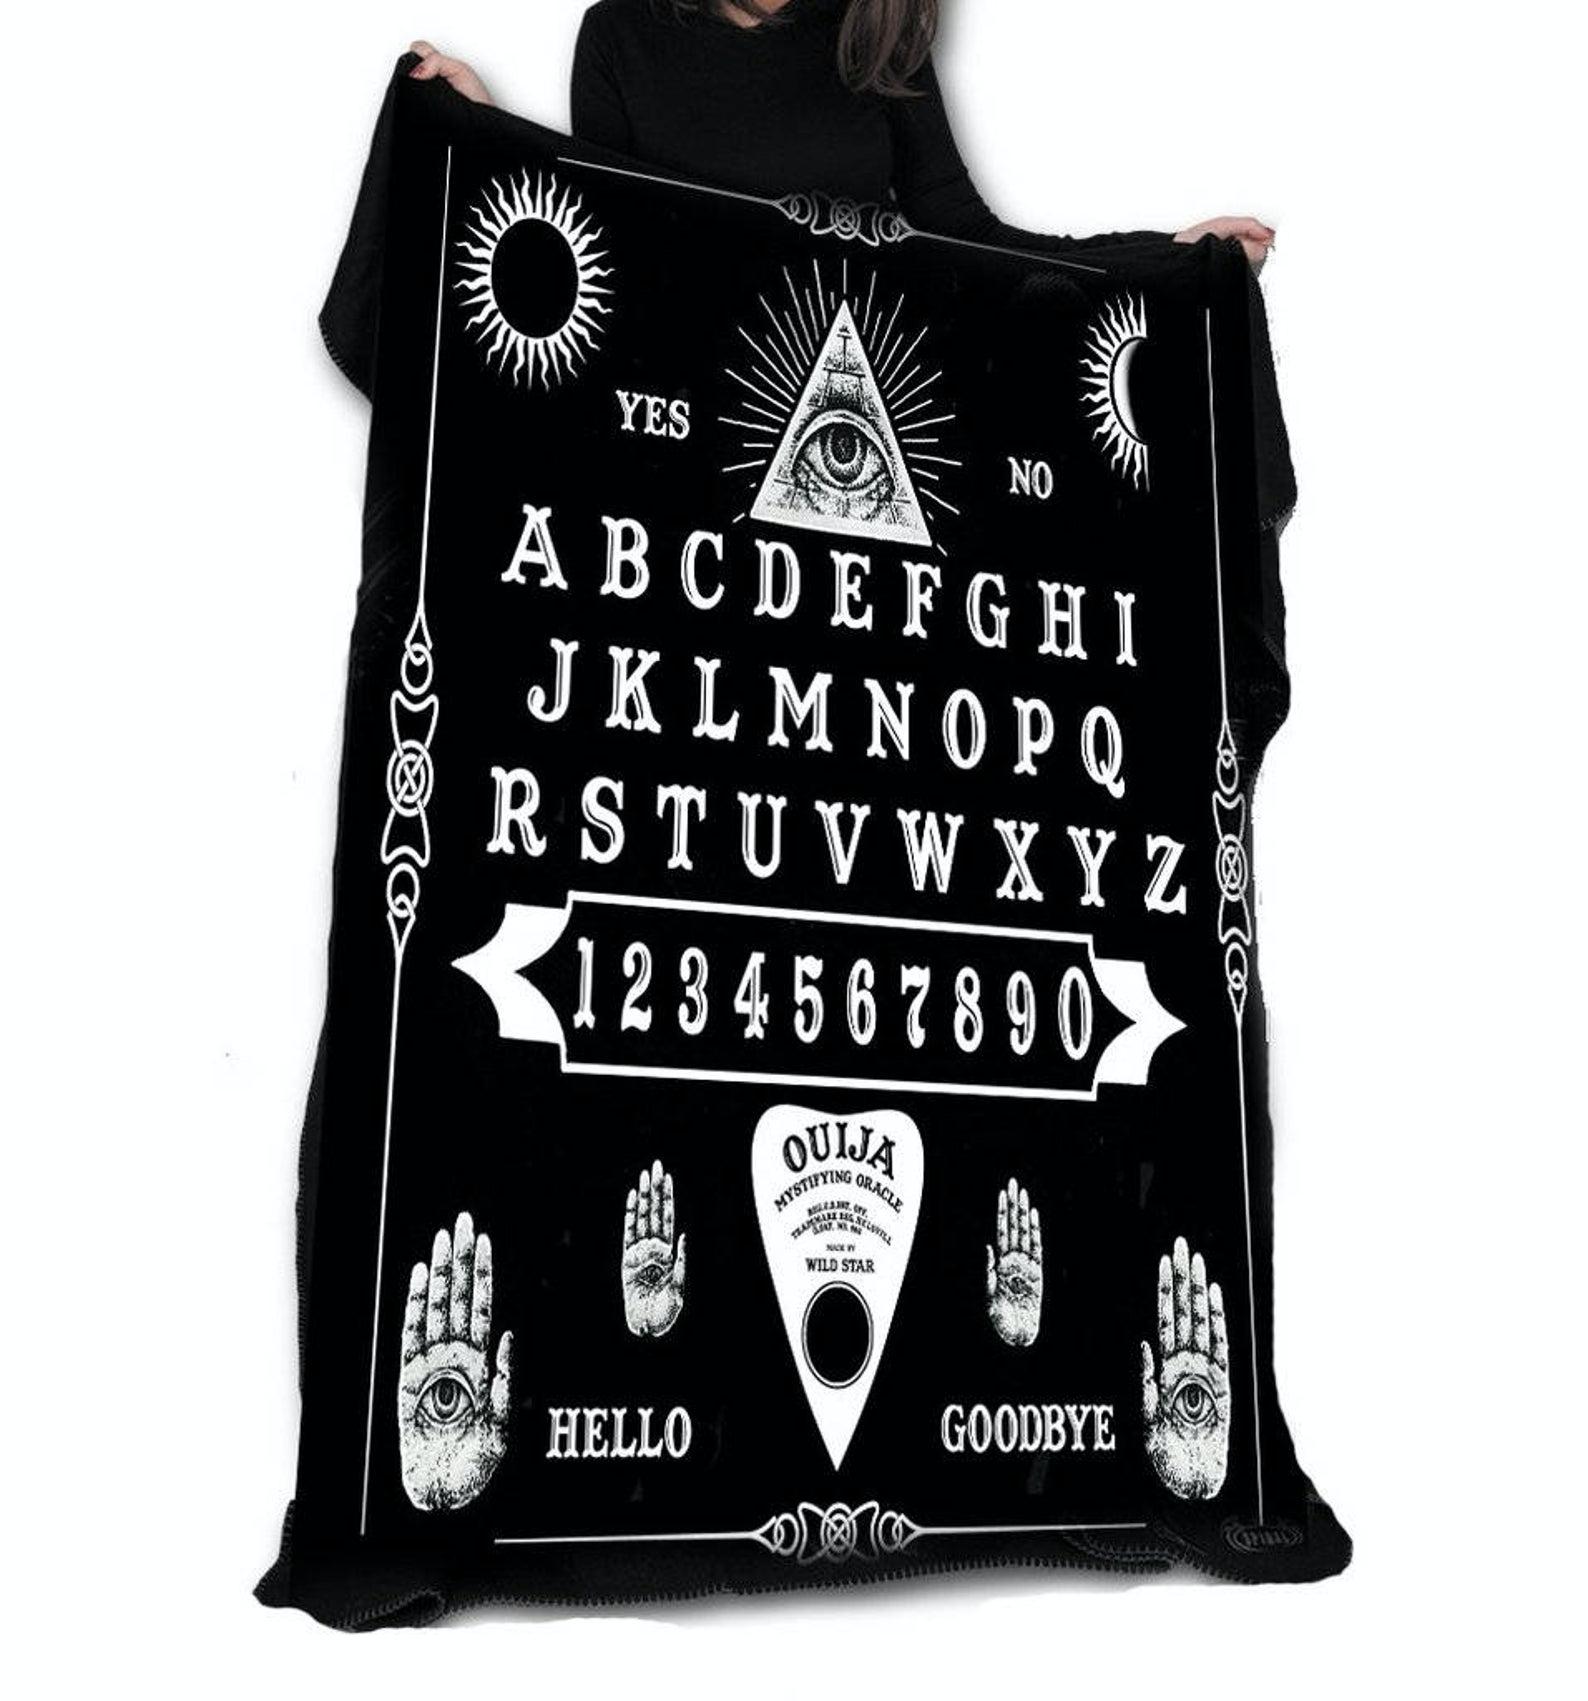 ouija board blanket - non-cheesy halloween decorations